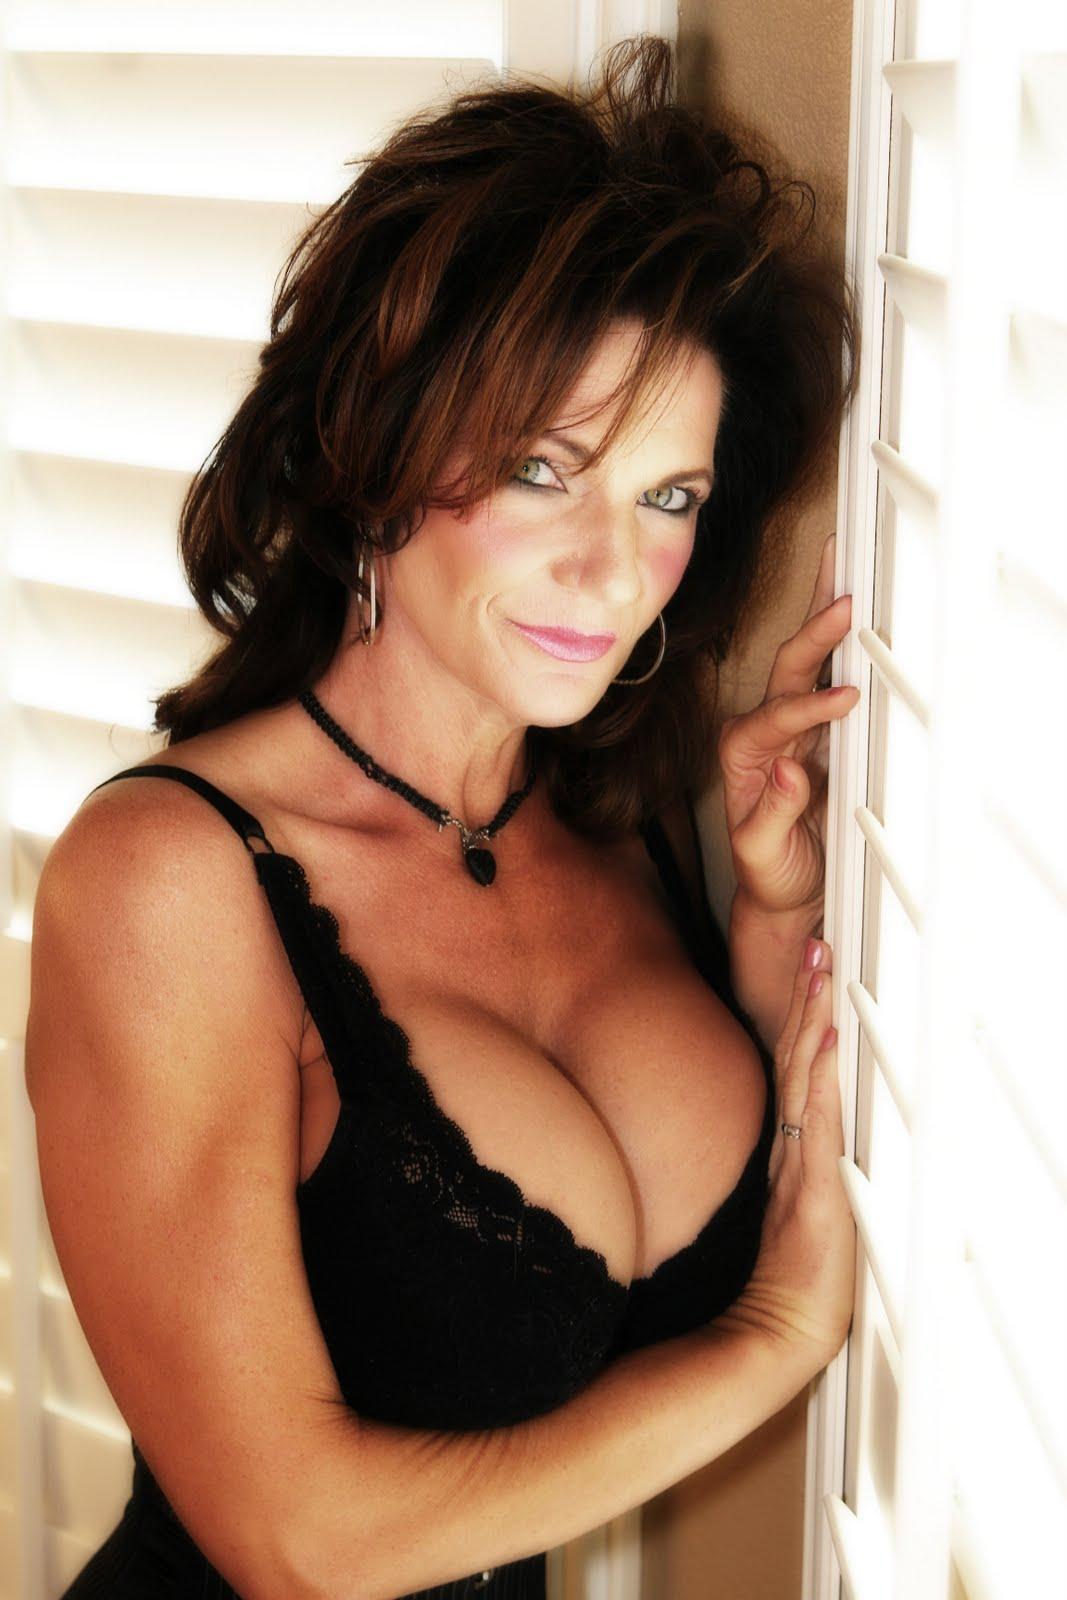 Breast expansion skyrim